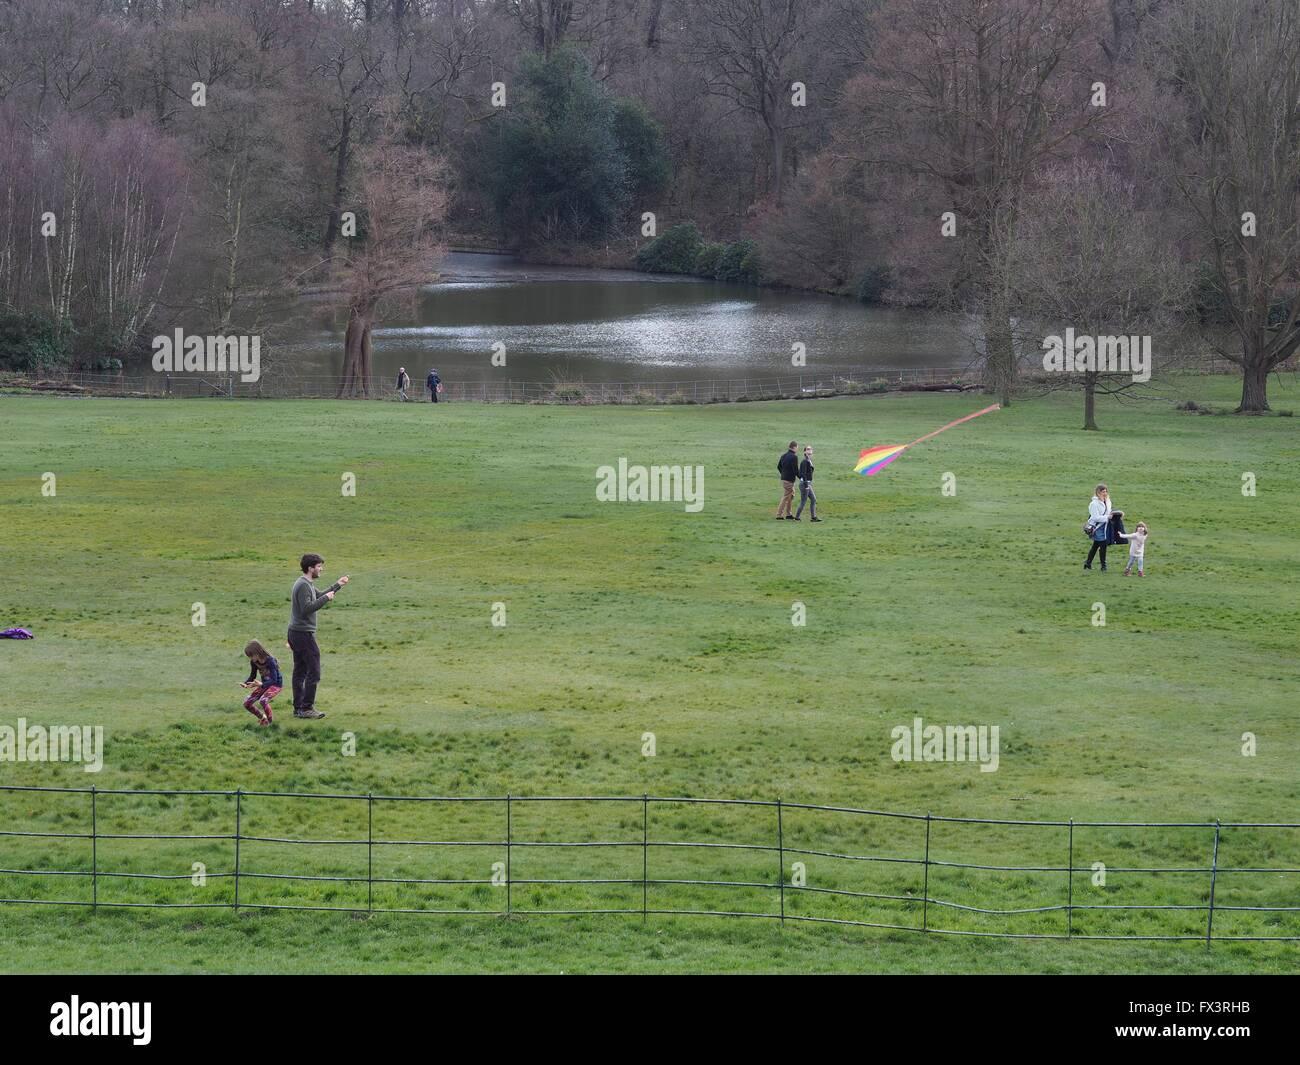 park, parks, Kenwood House, Hampstead, West Hampstead, Park, parks, family - Stock Image